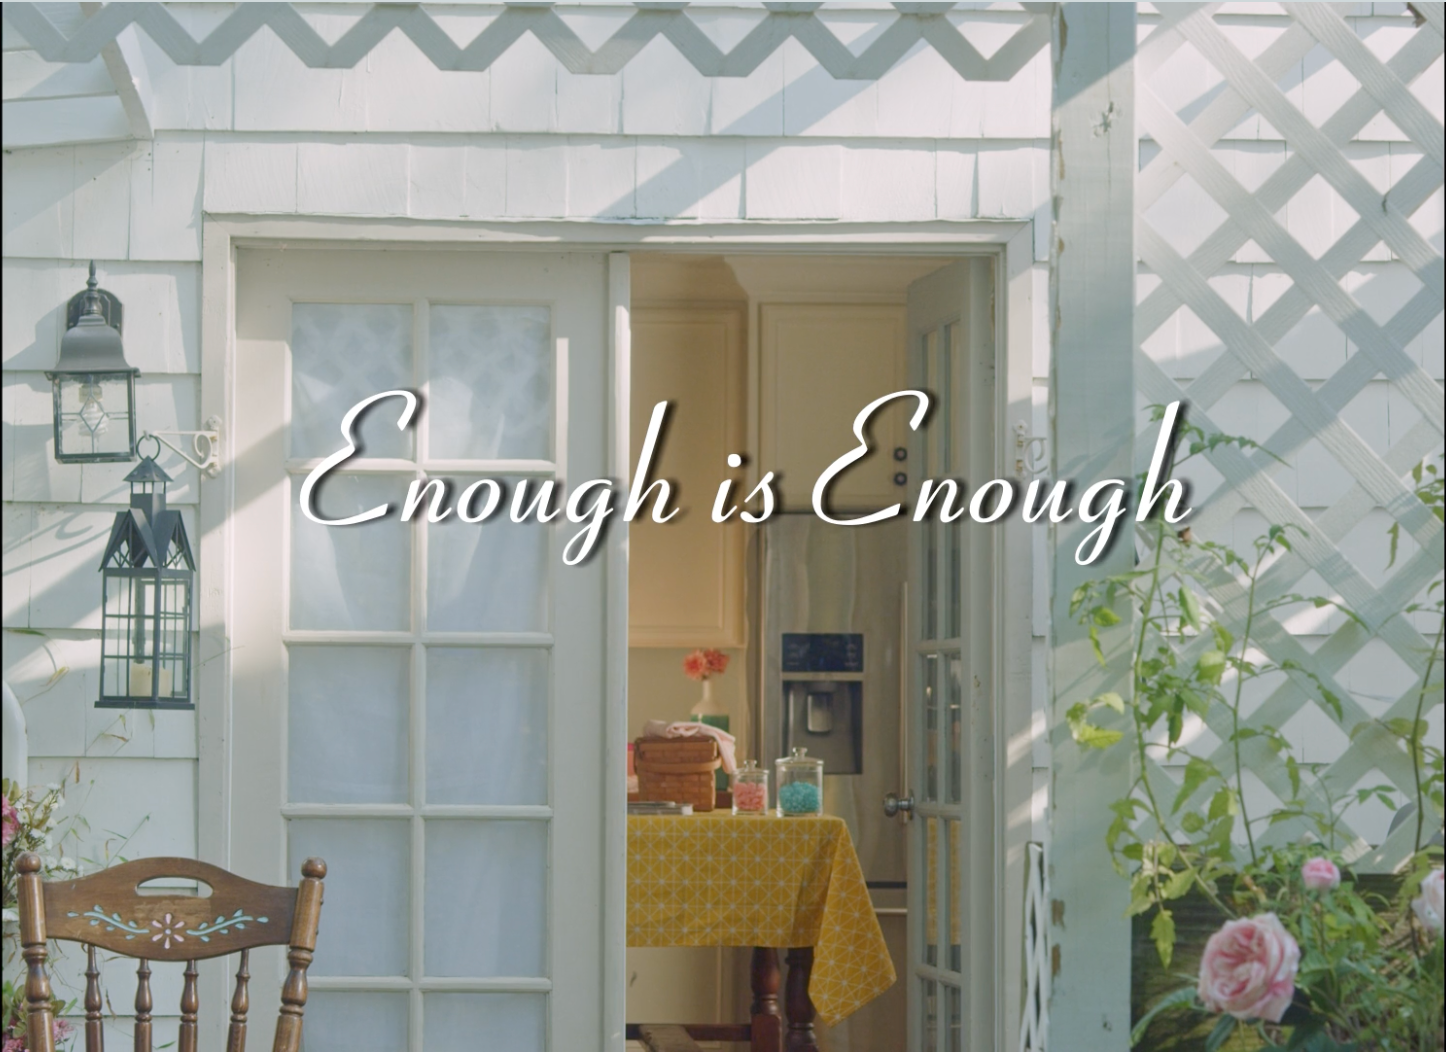 Enough is Eough